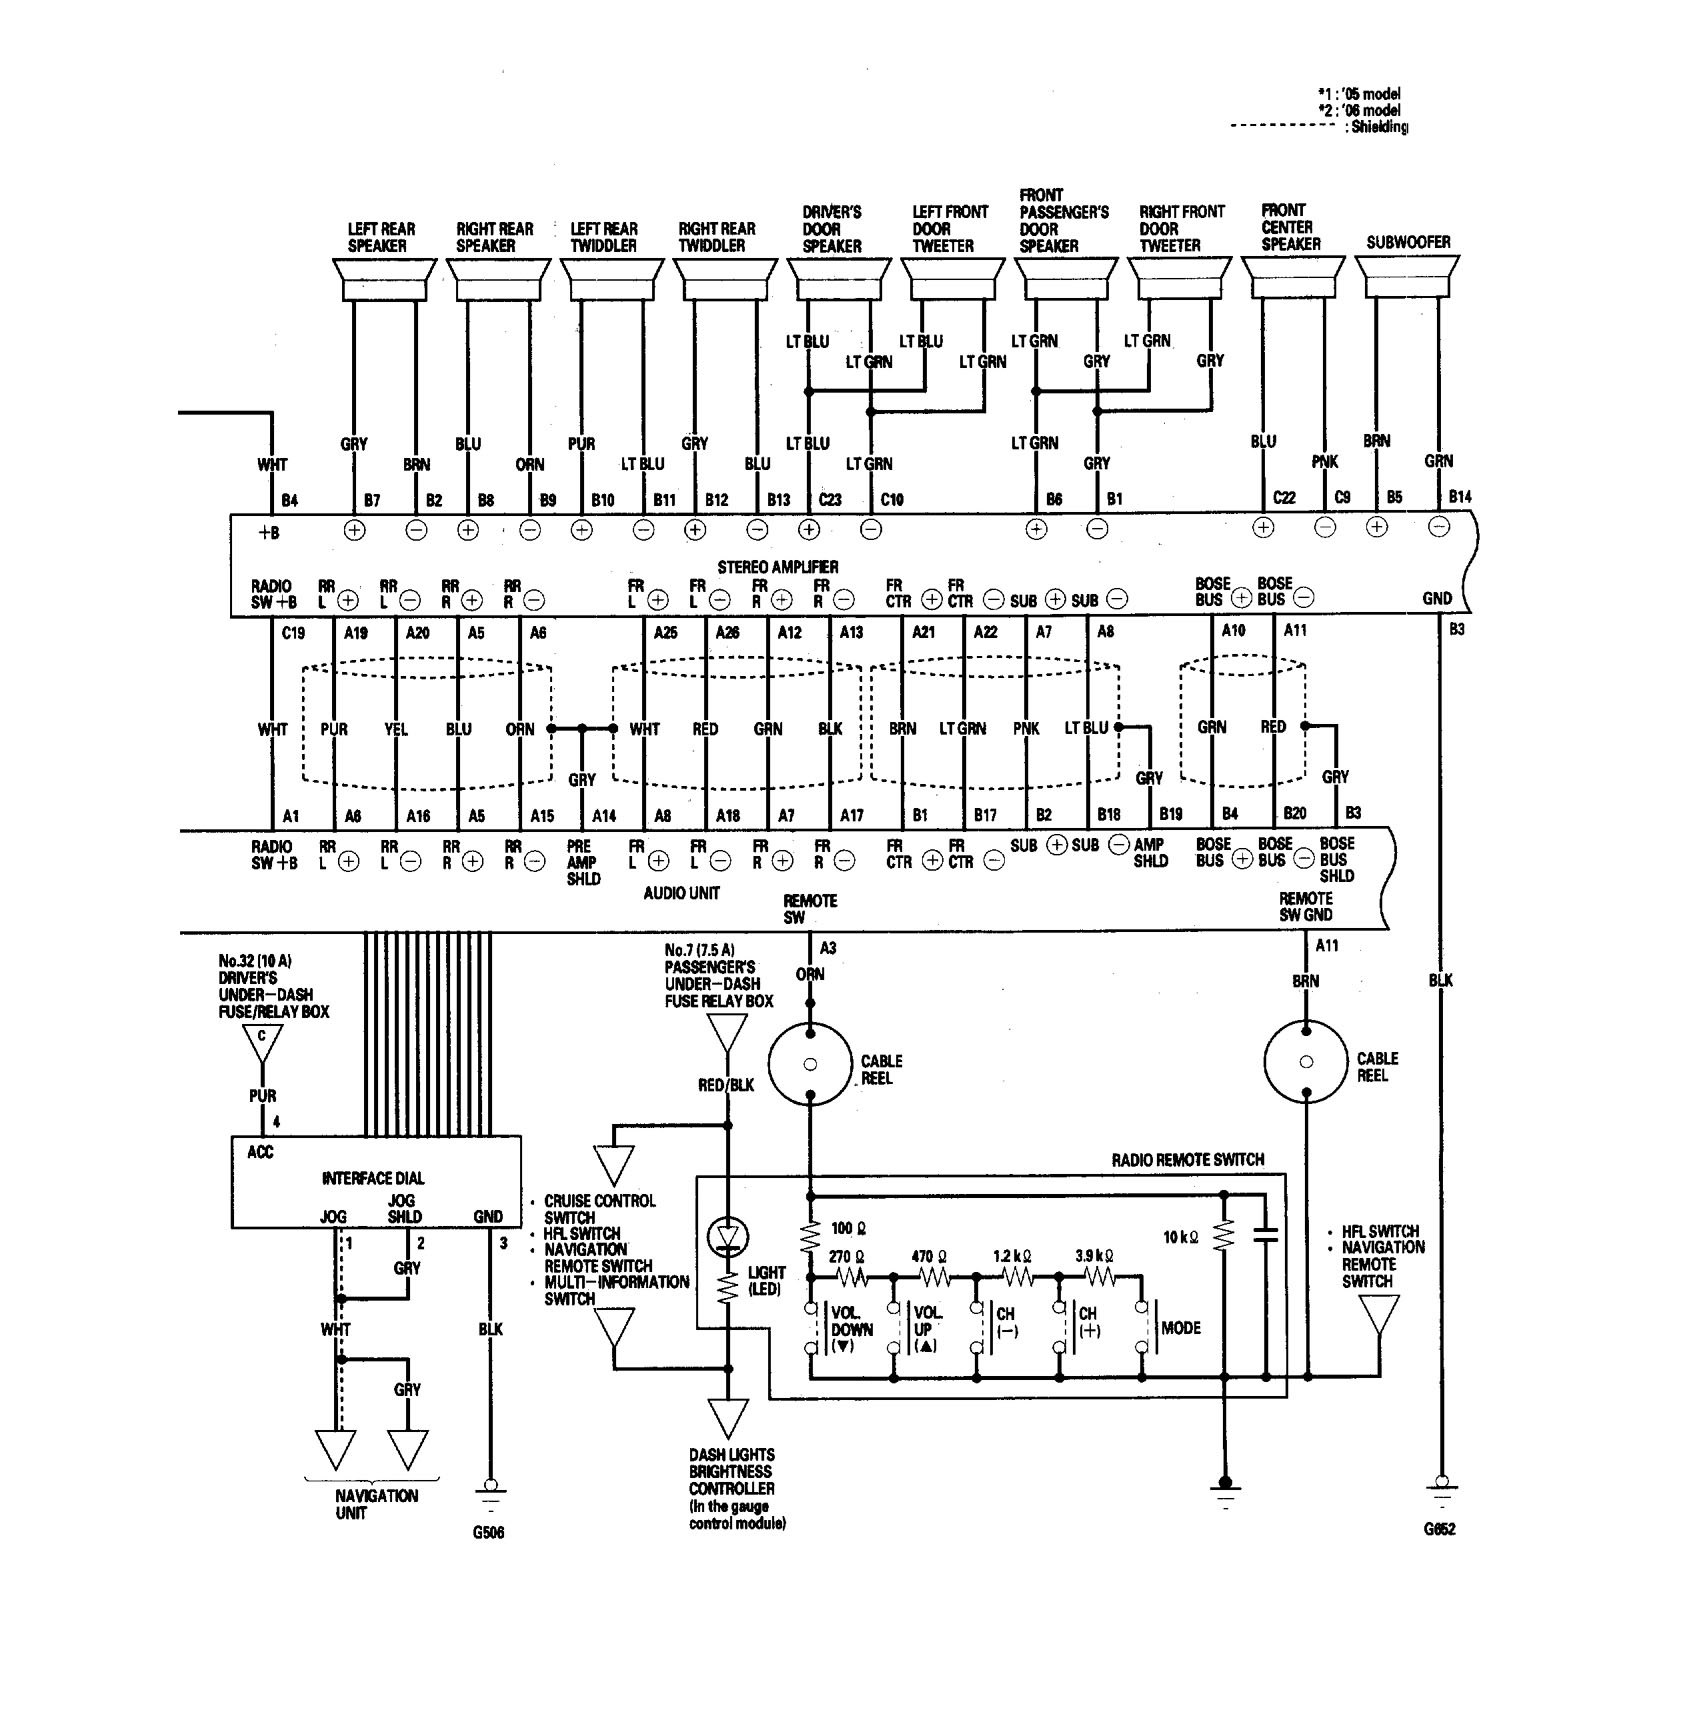 acura rl  2006  - wiring diagrams - audio